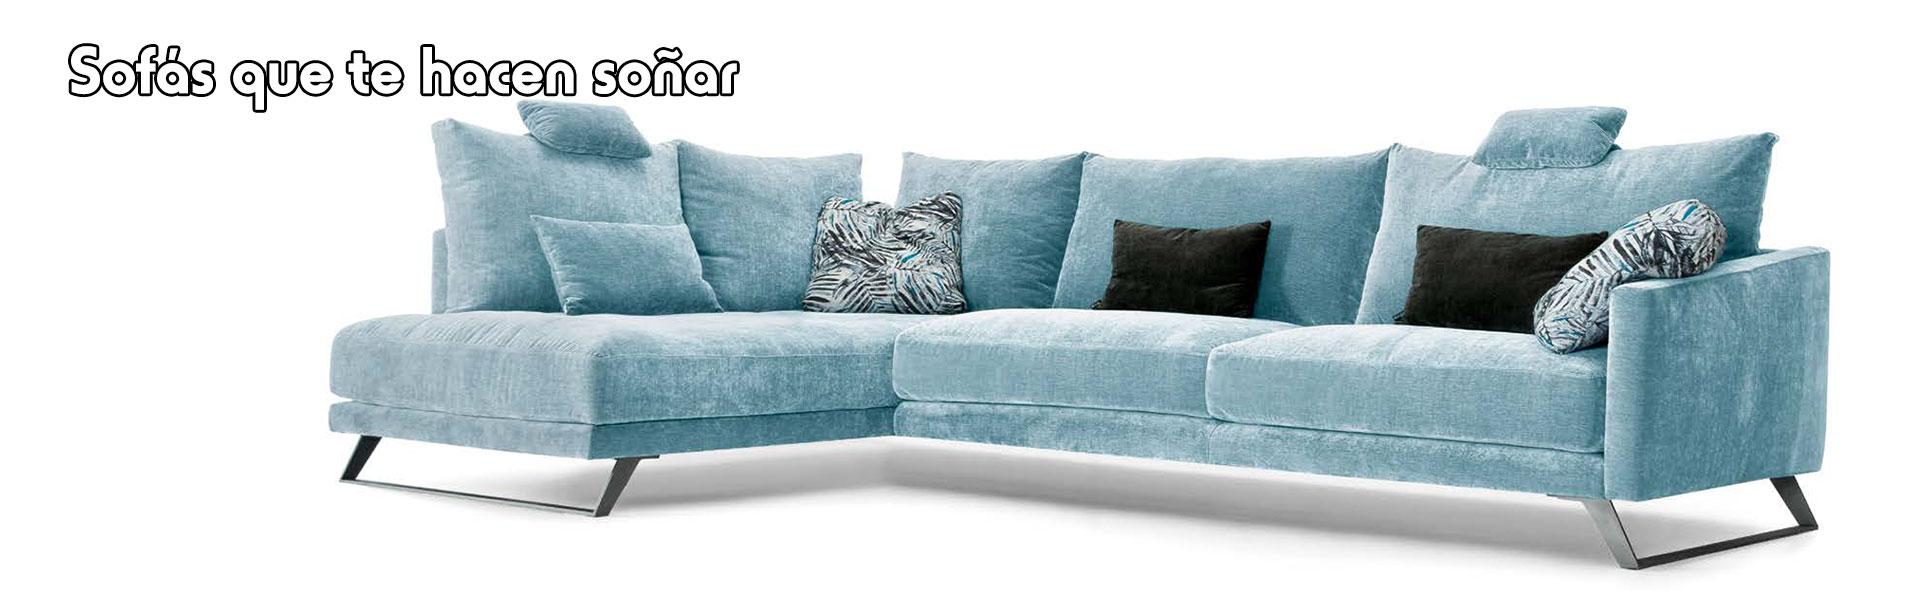 Sofa cayetana divani dvn